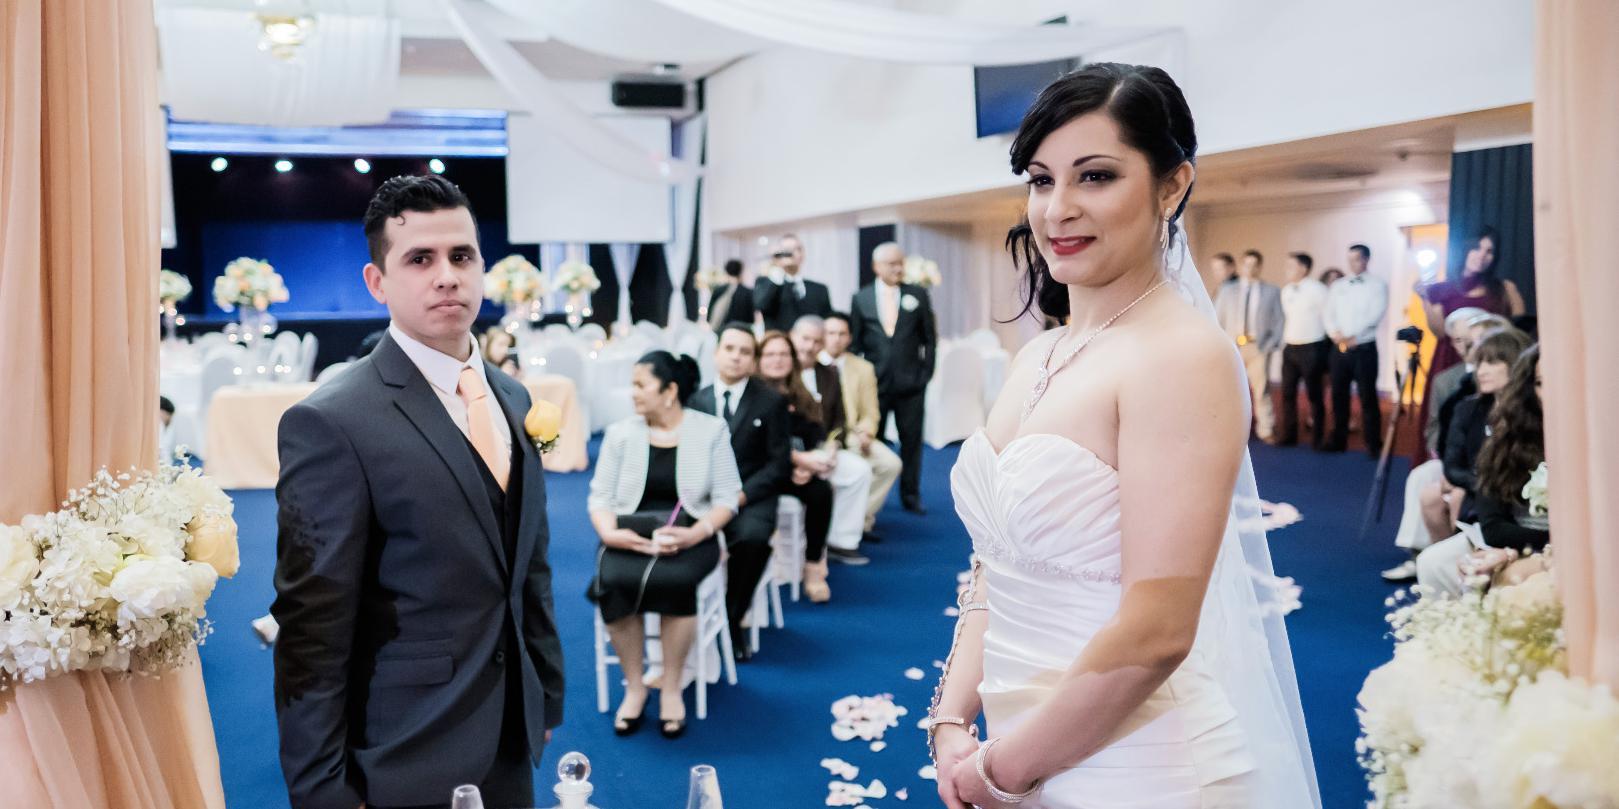 bodas-sin-clasificar-sin-tema-cuba-25781.jpg